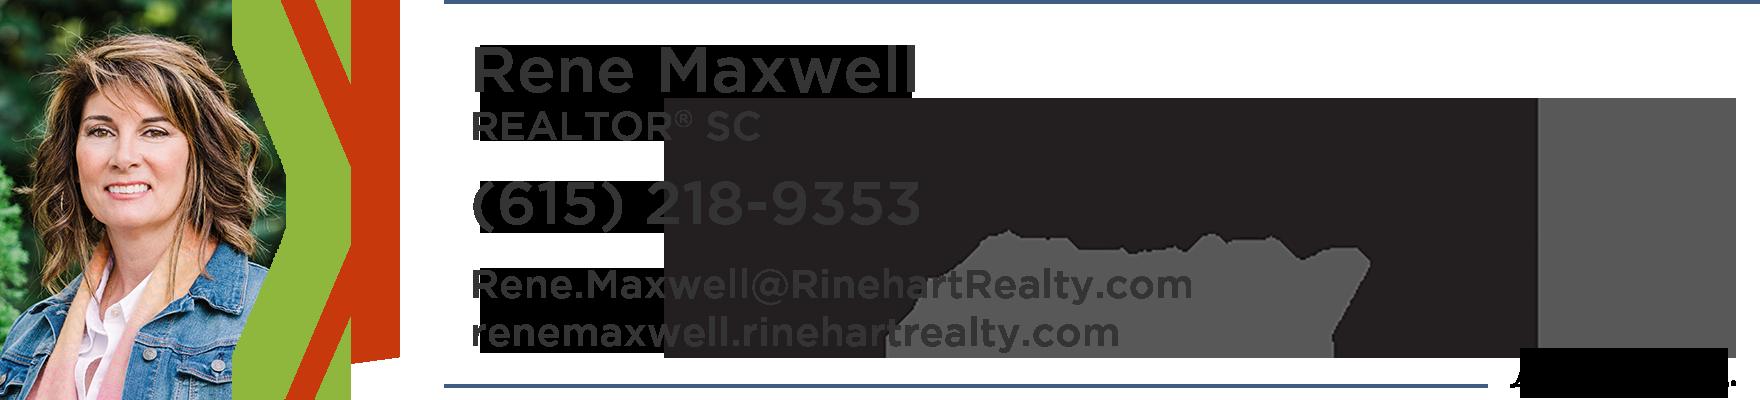 Rene Maxwell